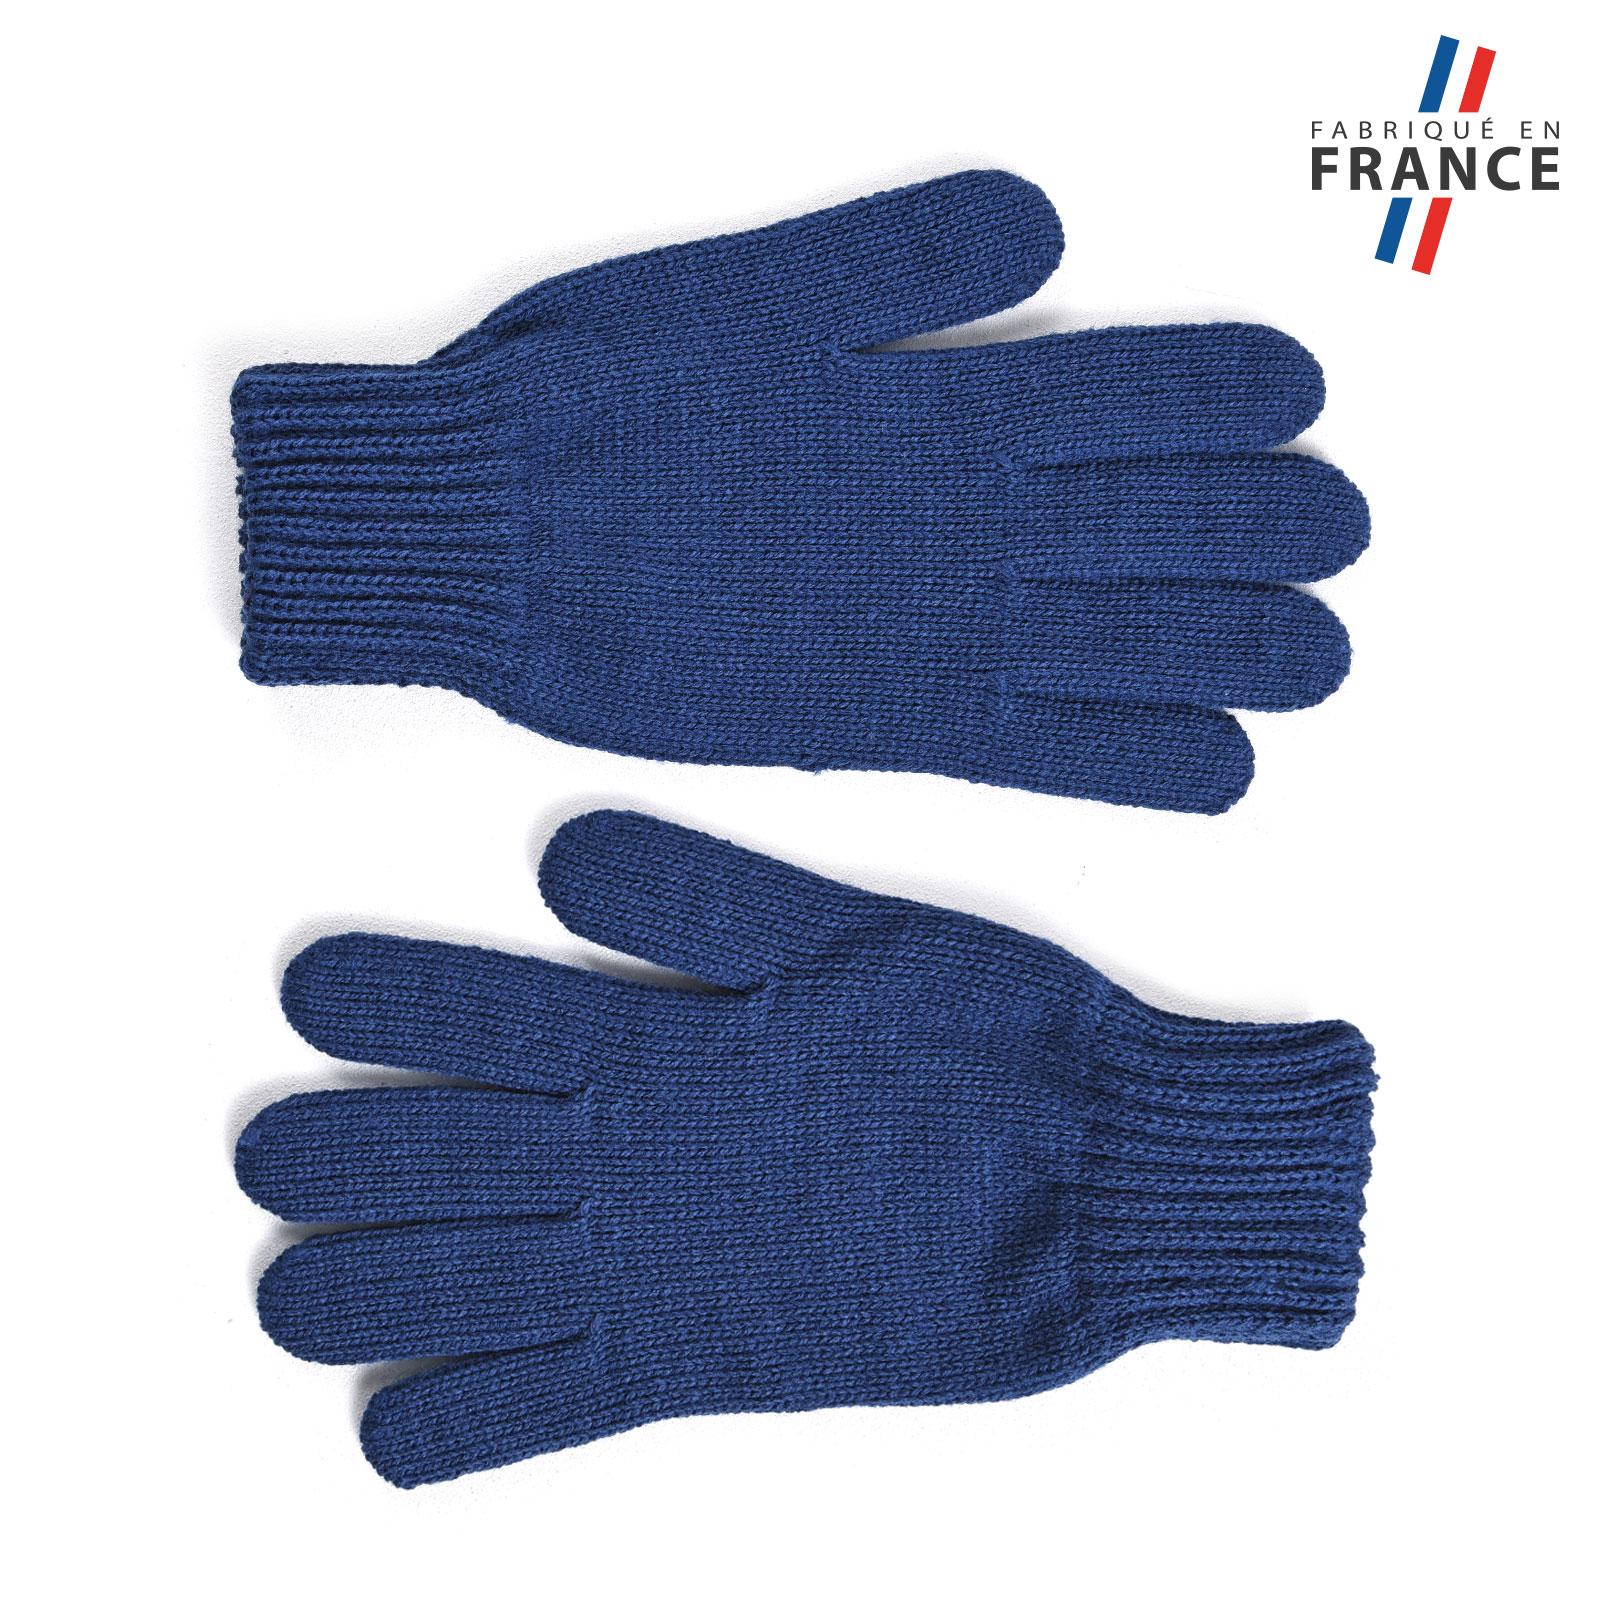 GA-00012-A16-LB_FR-gants-femme-bleu